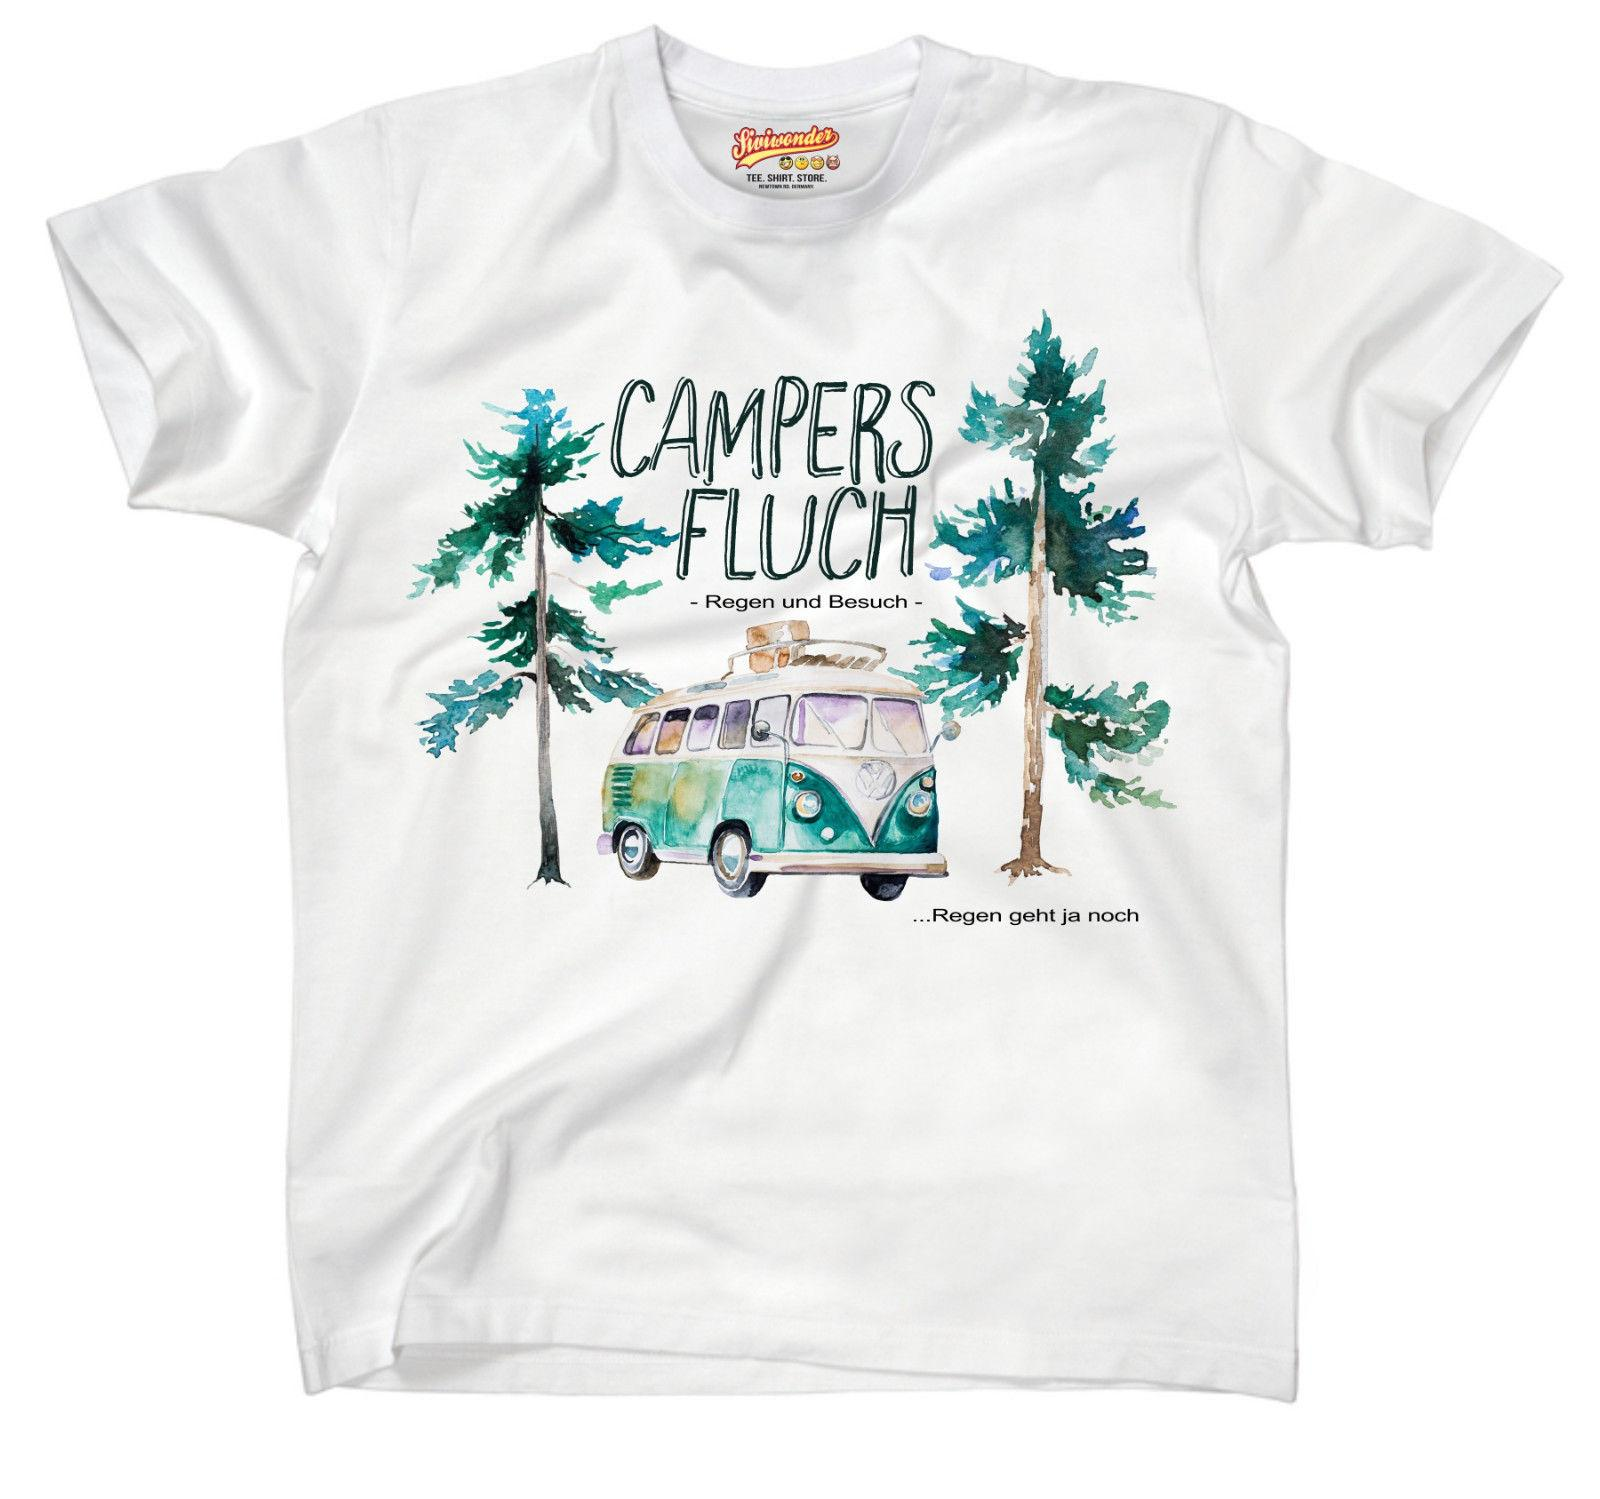 Uni T Shirt CAMPING CAMPERS FLUCH 2 BULLY Wohnwagen Regen Besuch Siviwonder Funny free shipping Uni